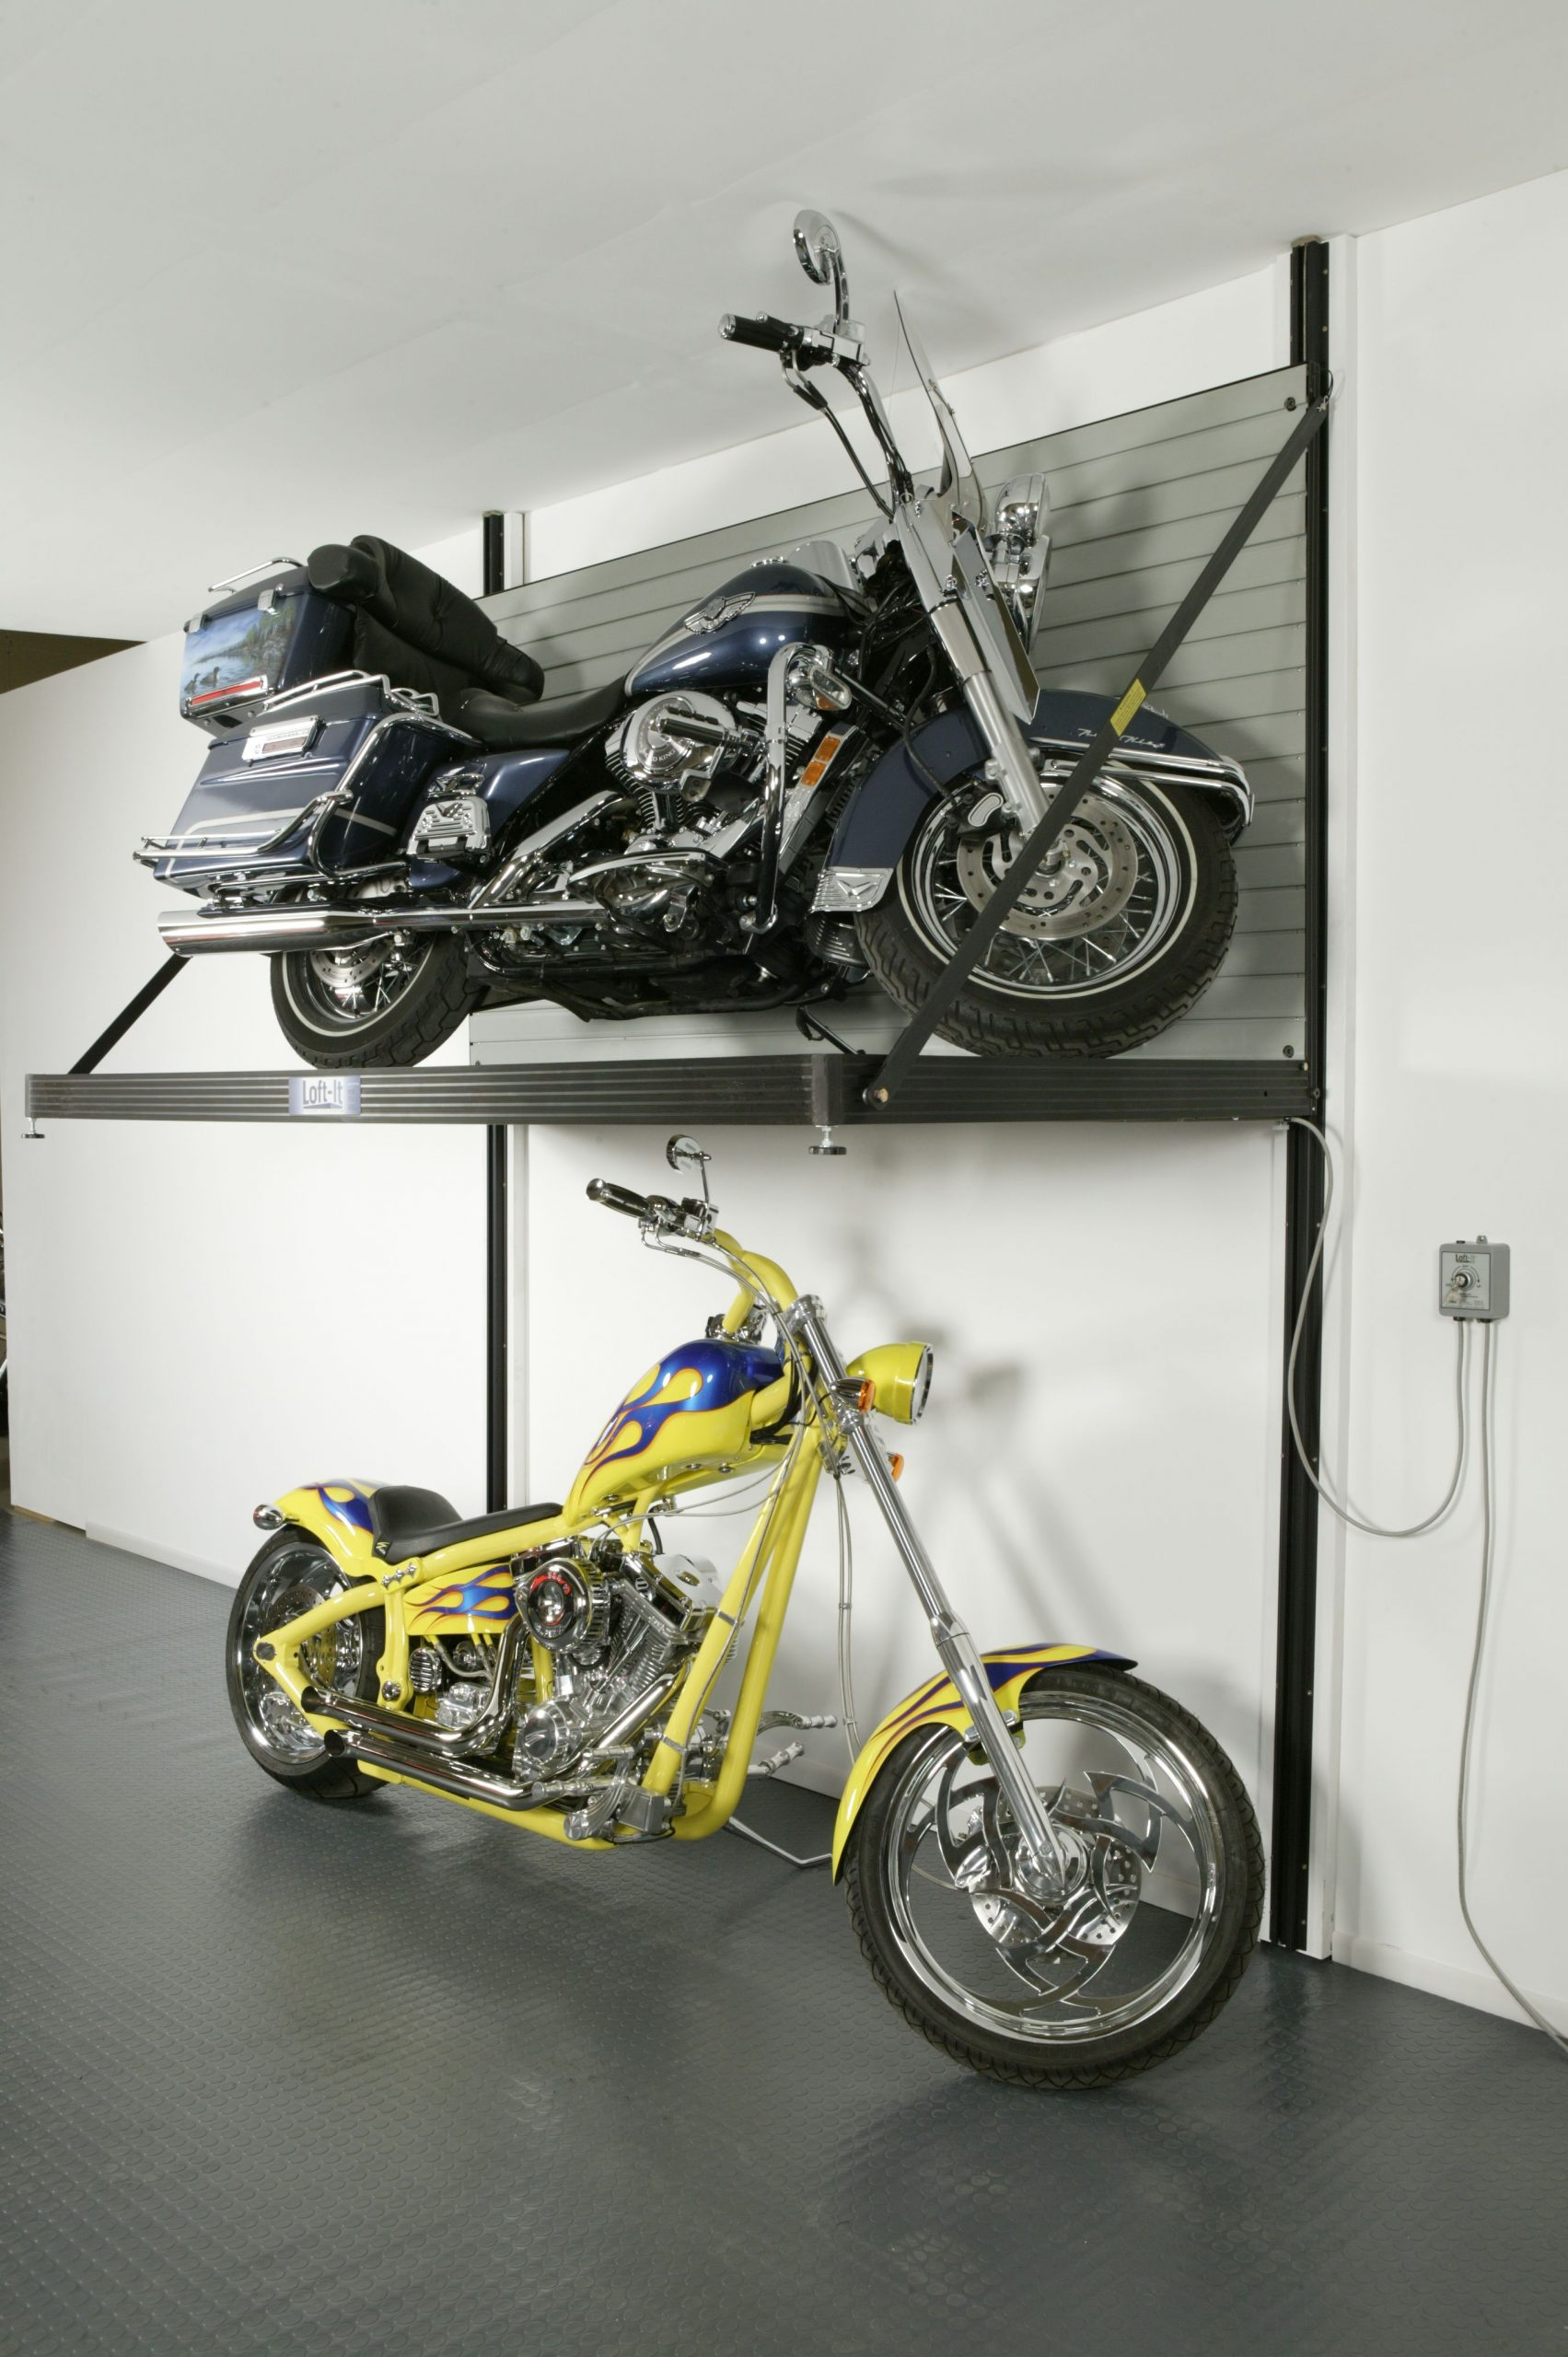 Motorcycle & Atv Lifts For The Garage In Parrish Fl | Abri ... intérieur Ides Abri Moto